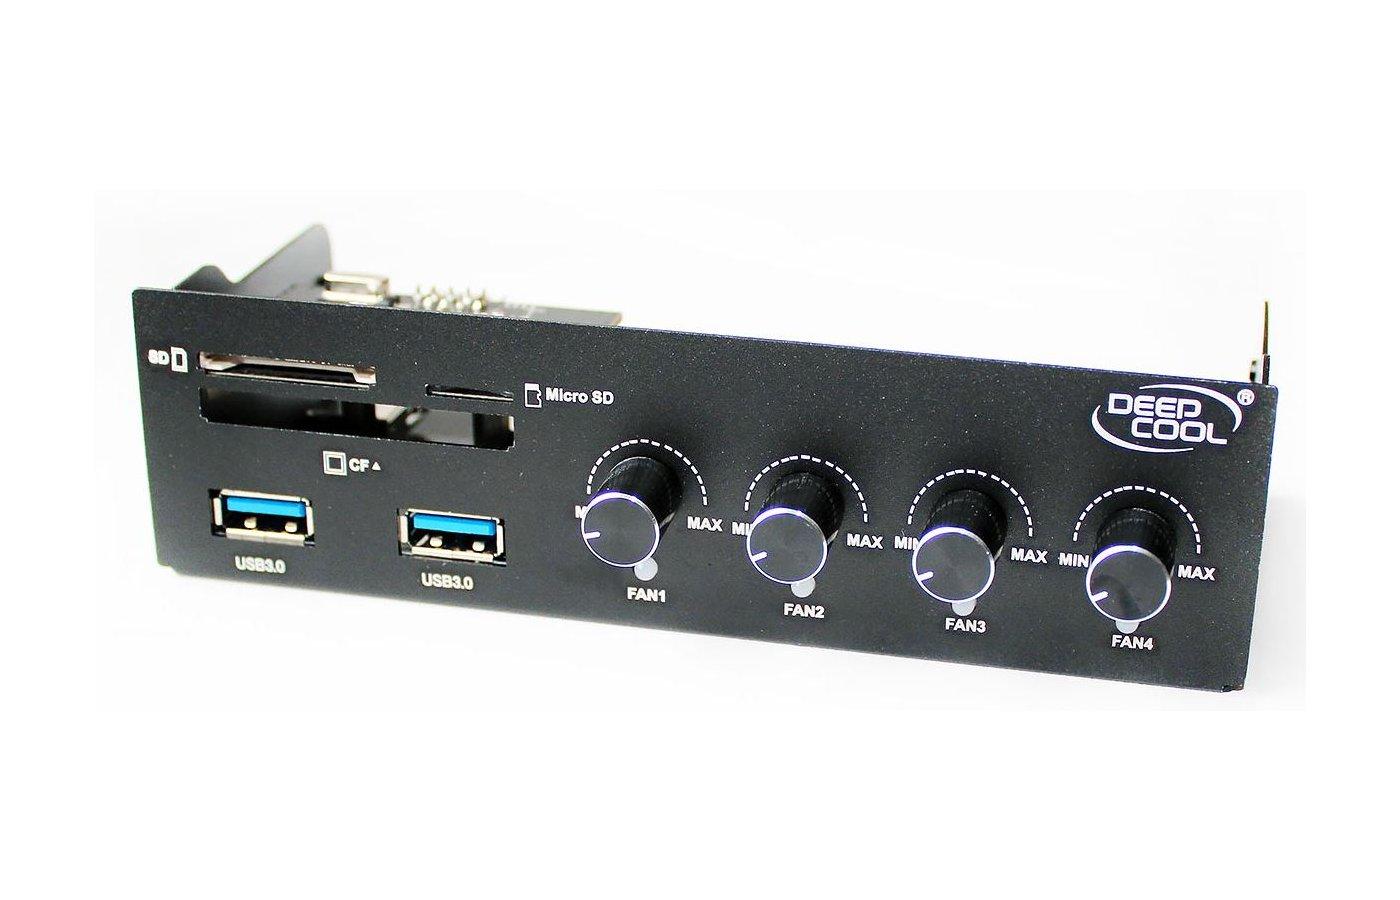 Охлаждение Deepcool ROCK MASTER V3.0 3pin 339g слот 5.25 with Card reader CF/SD/Micro SD/2xUSB 3.0 RTL